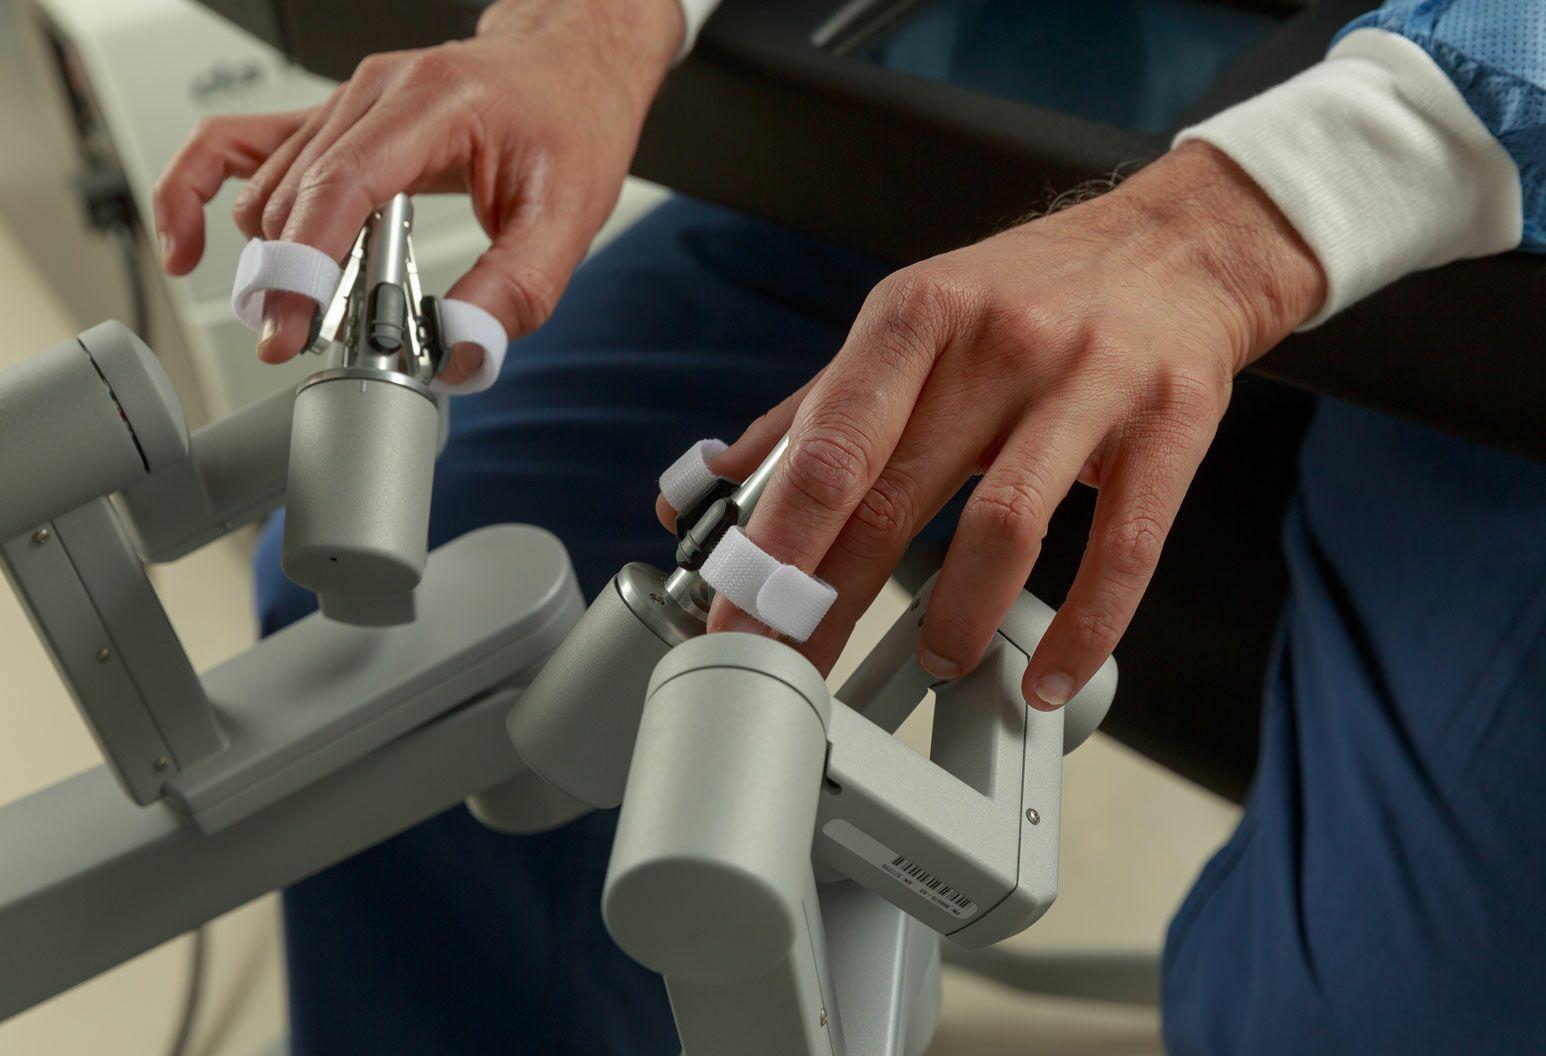 A close up of a doctors hands performing robotic surgery.